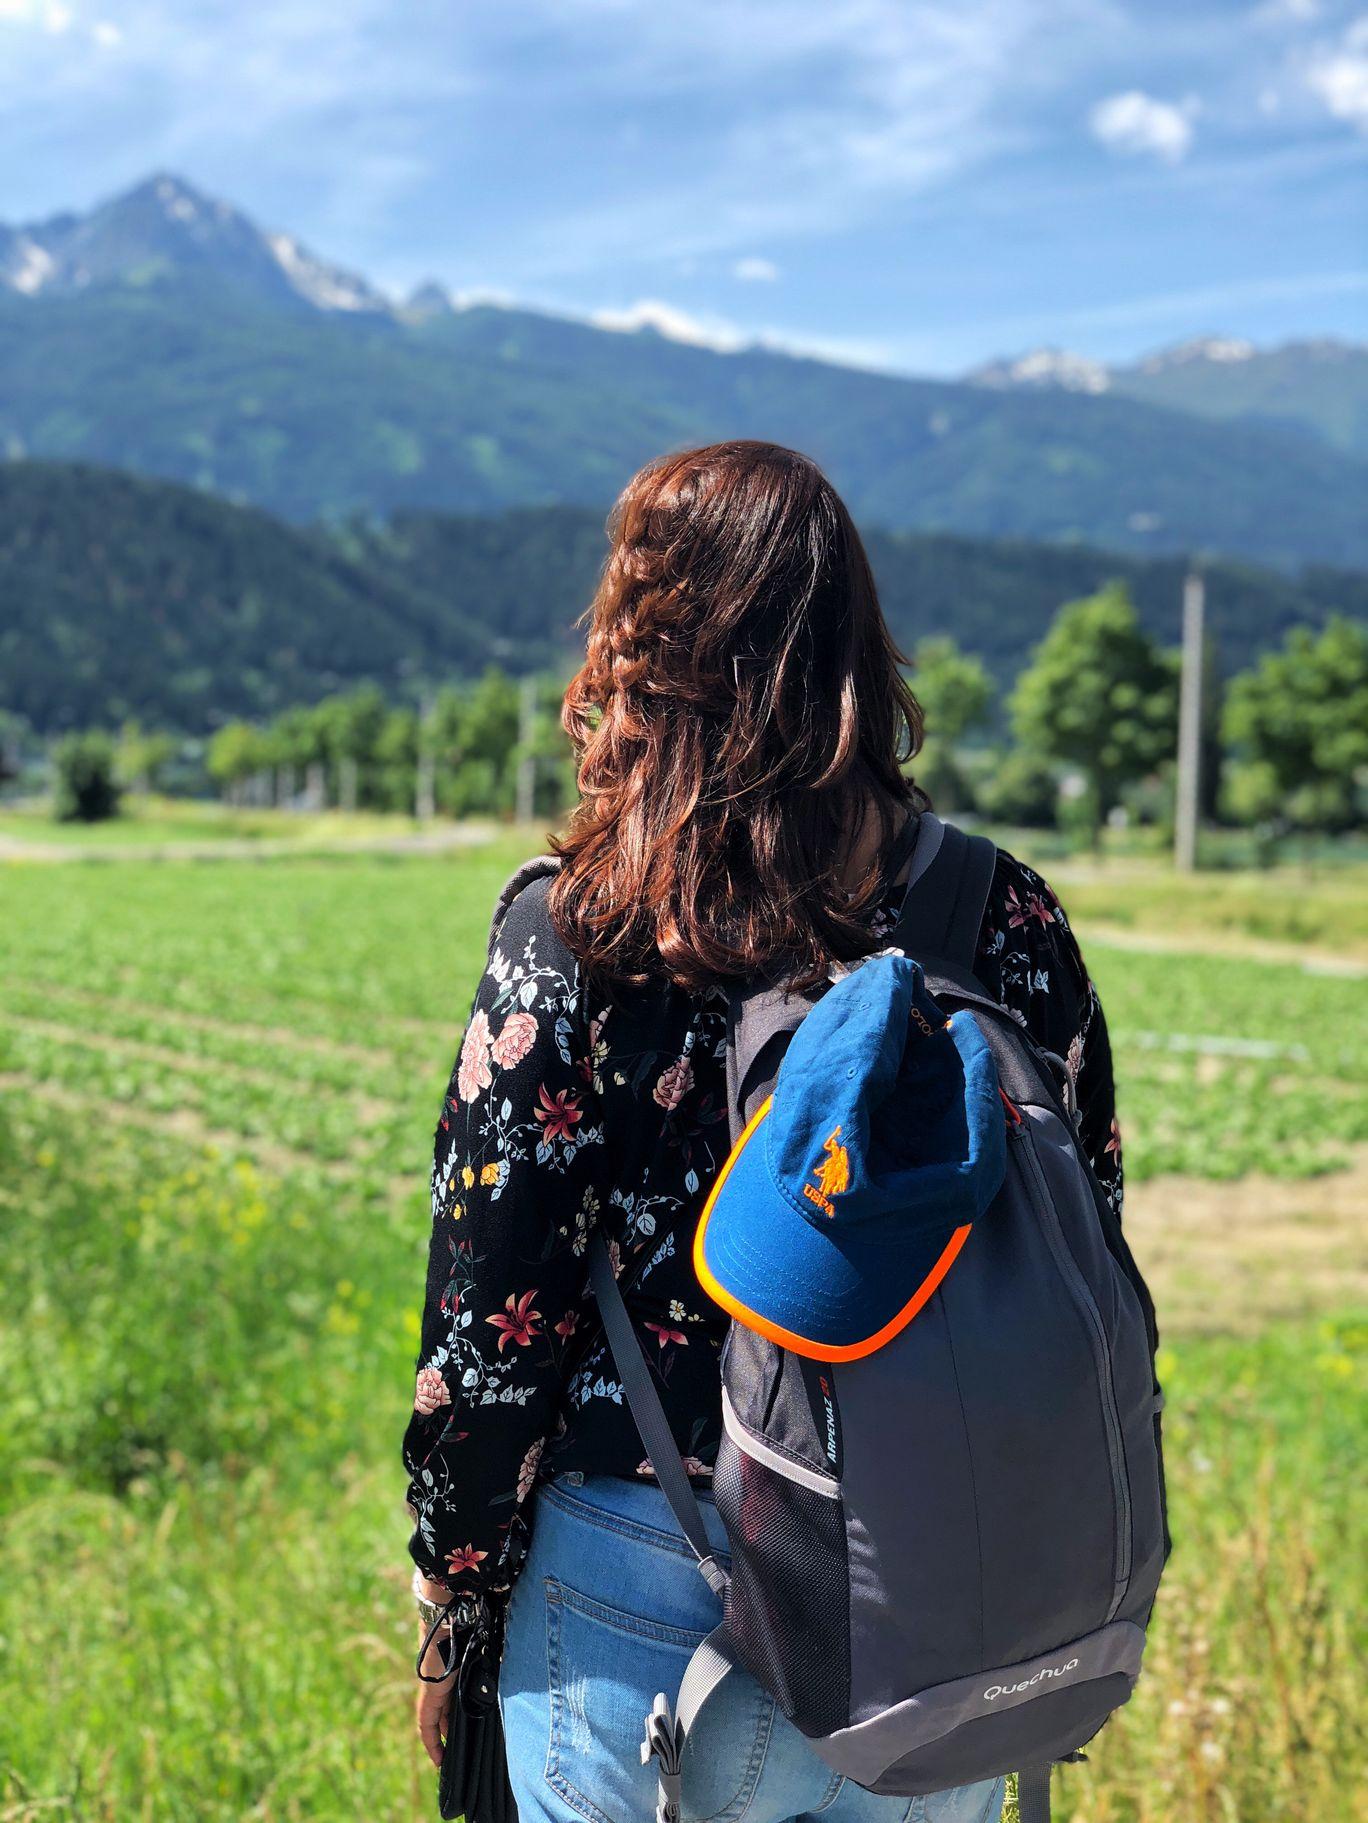 Photo of Innsbruck By Dr. Avassh Kaul